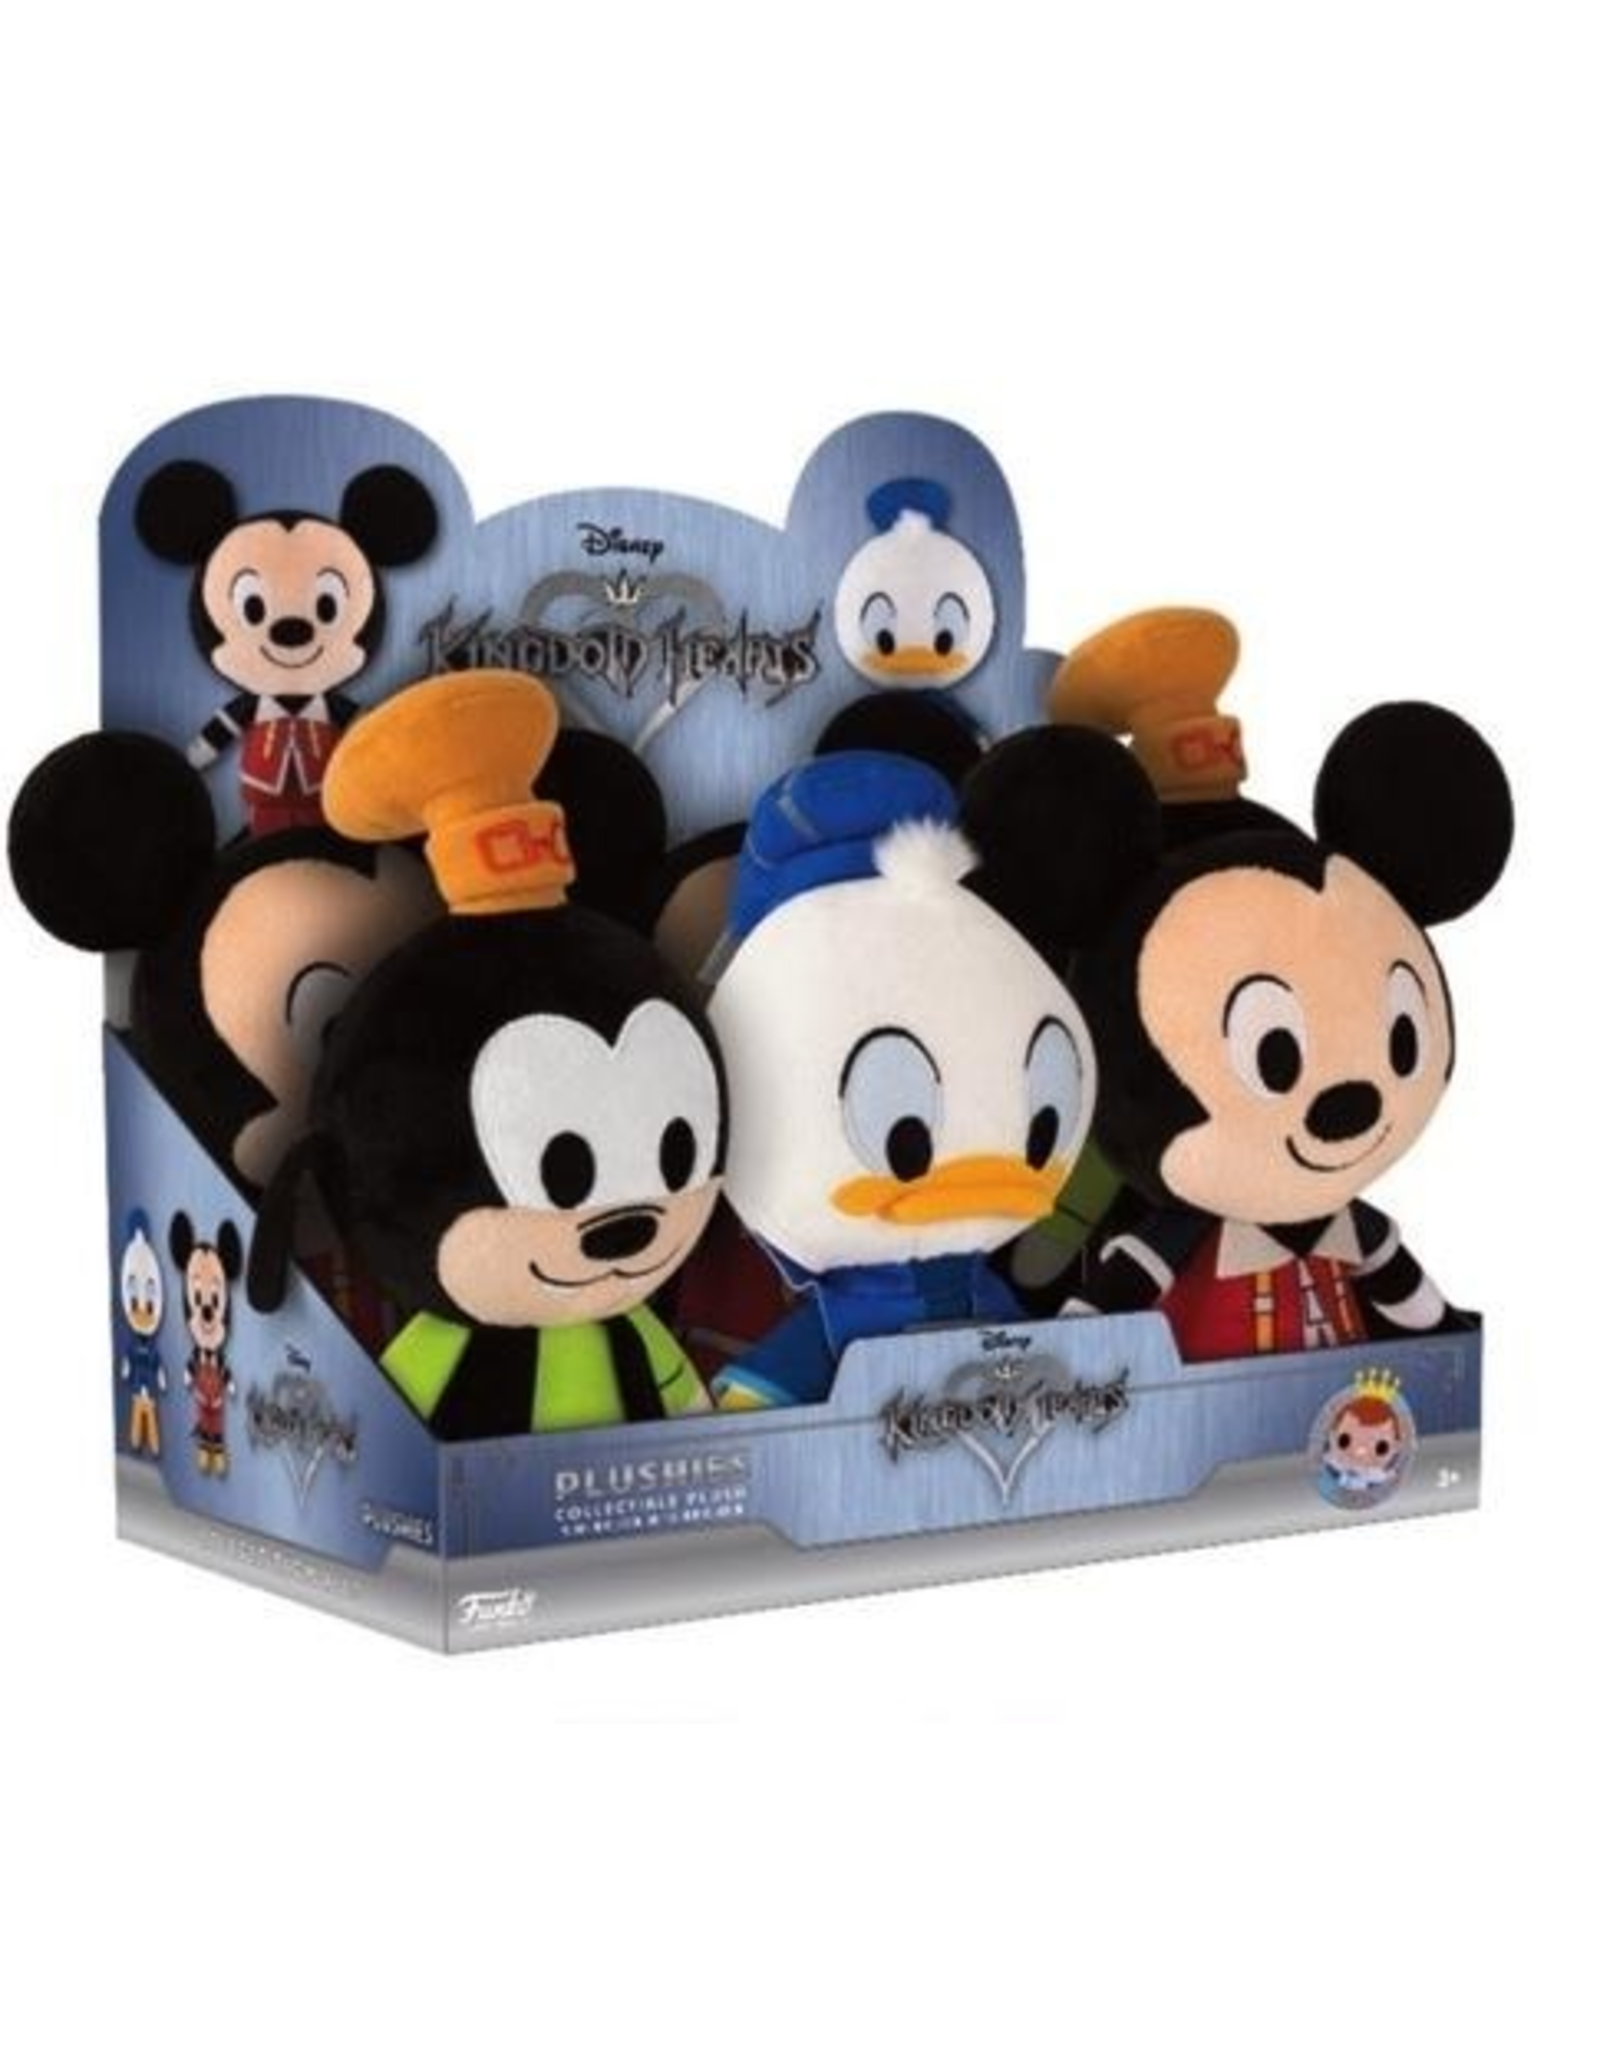 DISNEY - Kingdom Hearts Plush 18cm - Donald